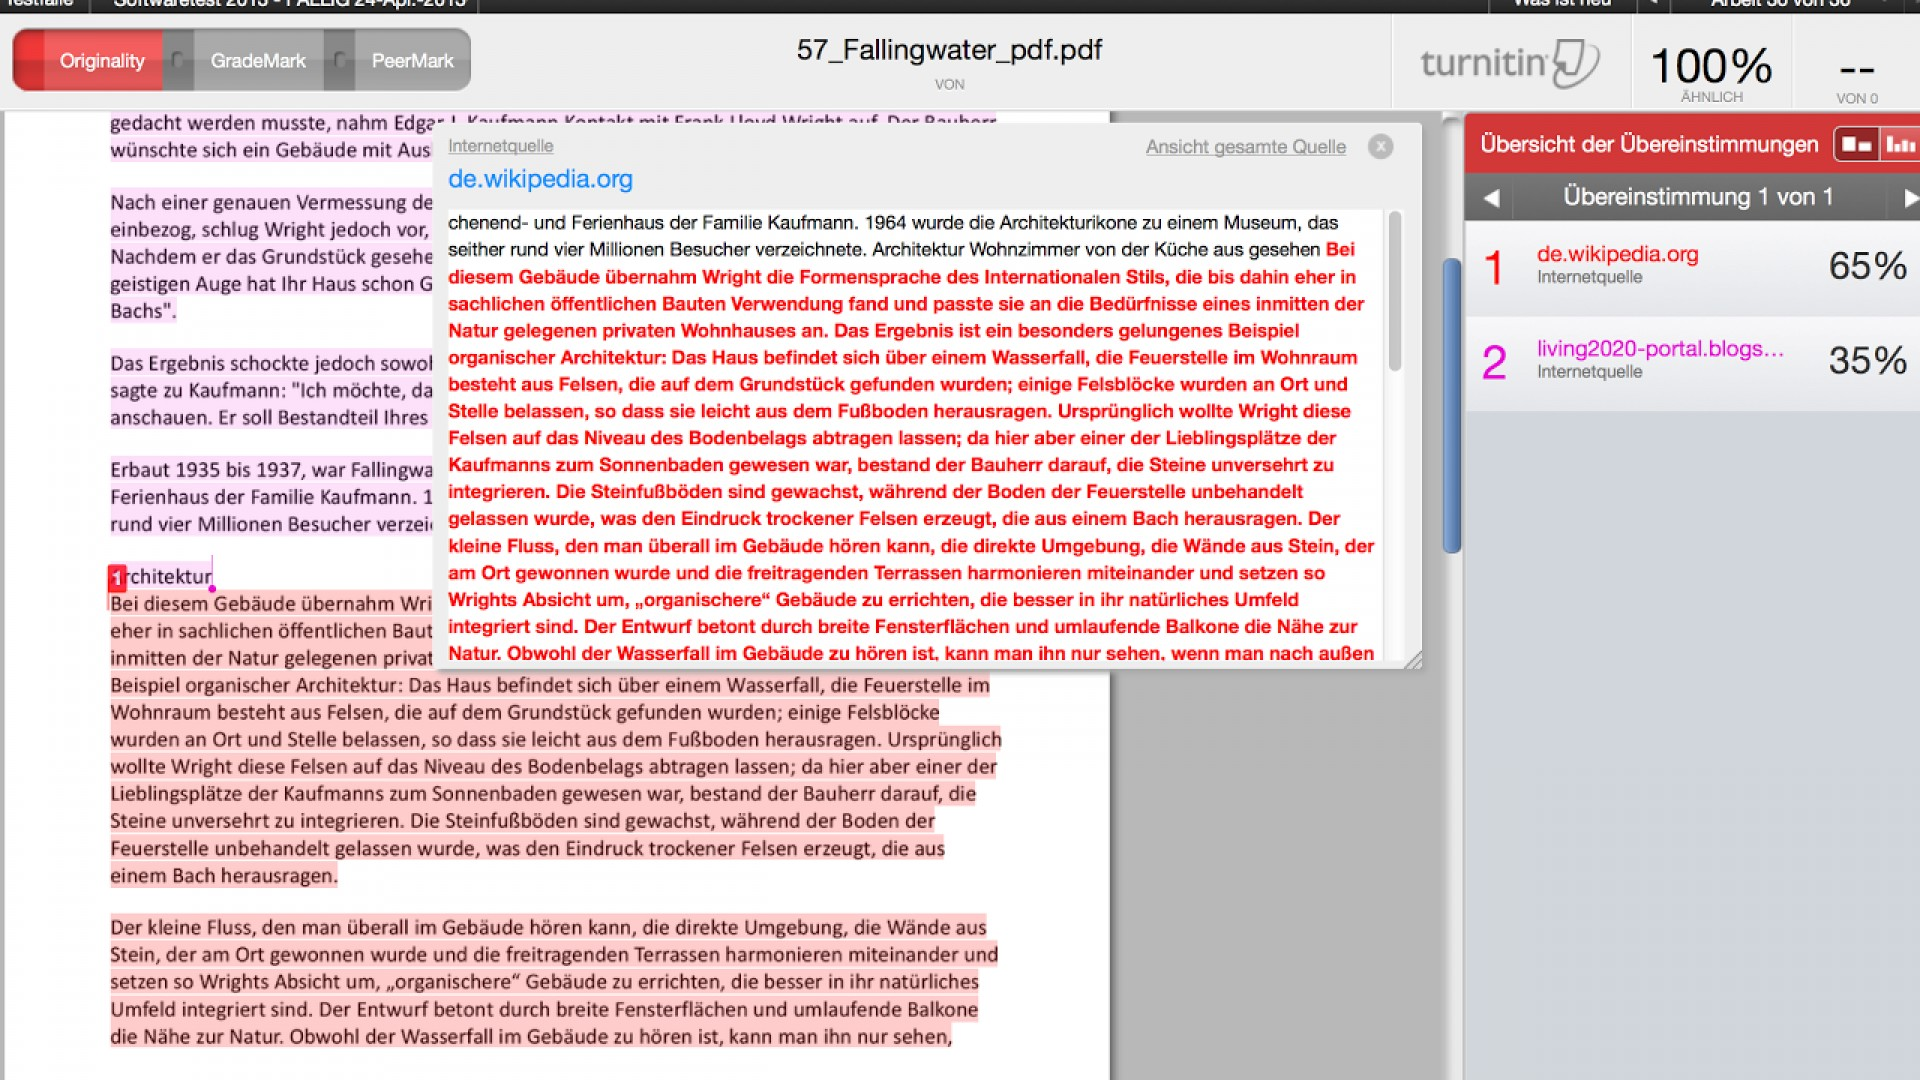 012 Essay Plagiarism Checker Maxresdefault Live Unforgettable Ieee Paper Online Uk 1920